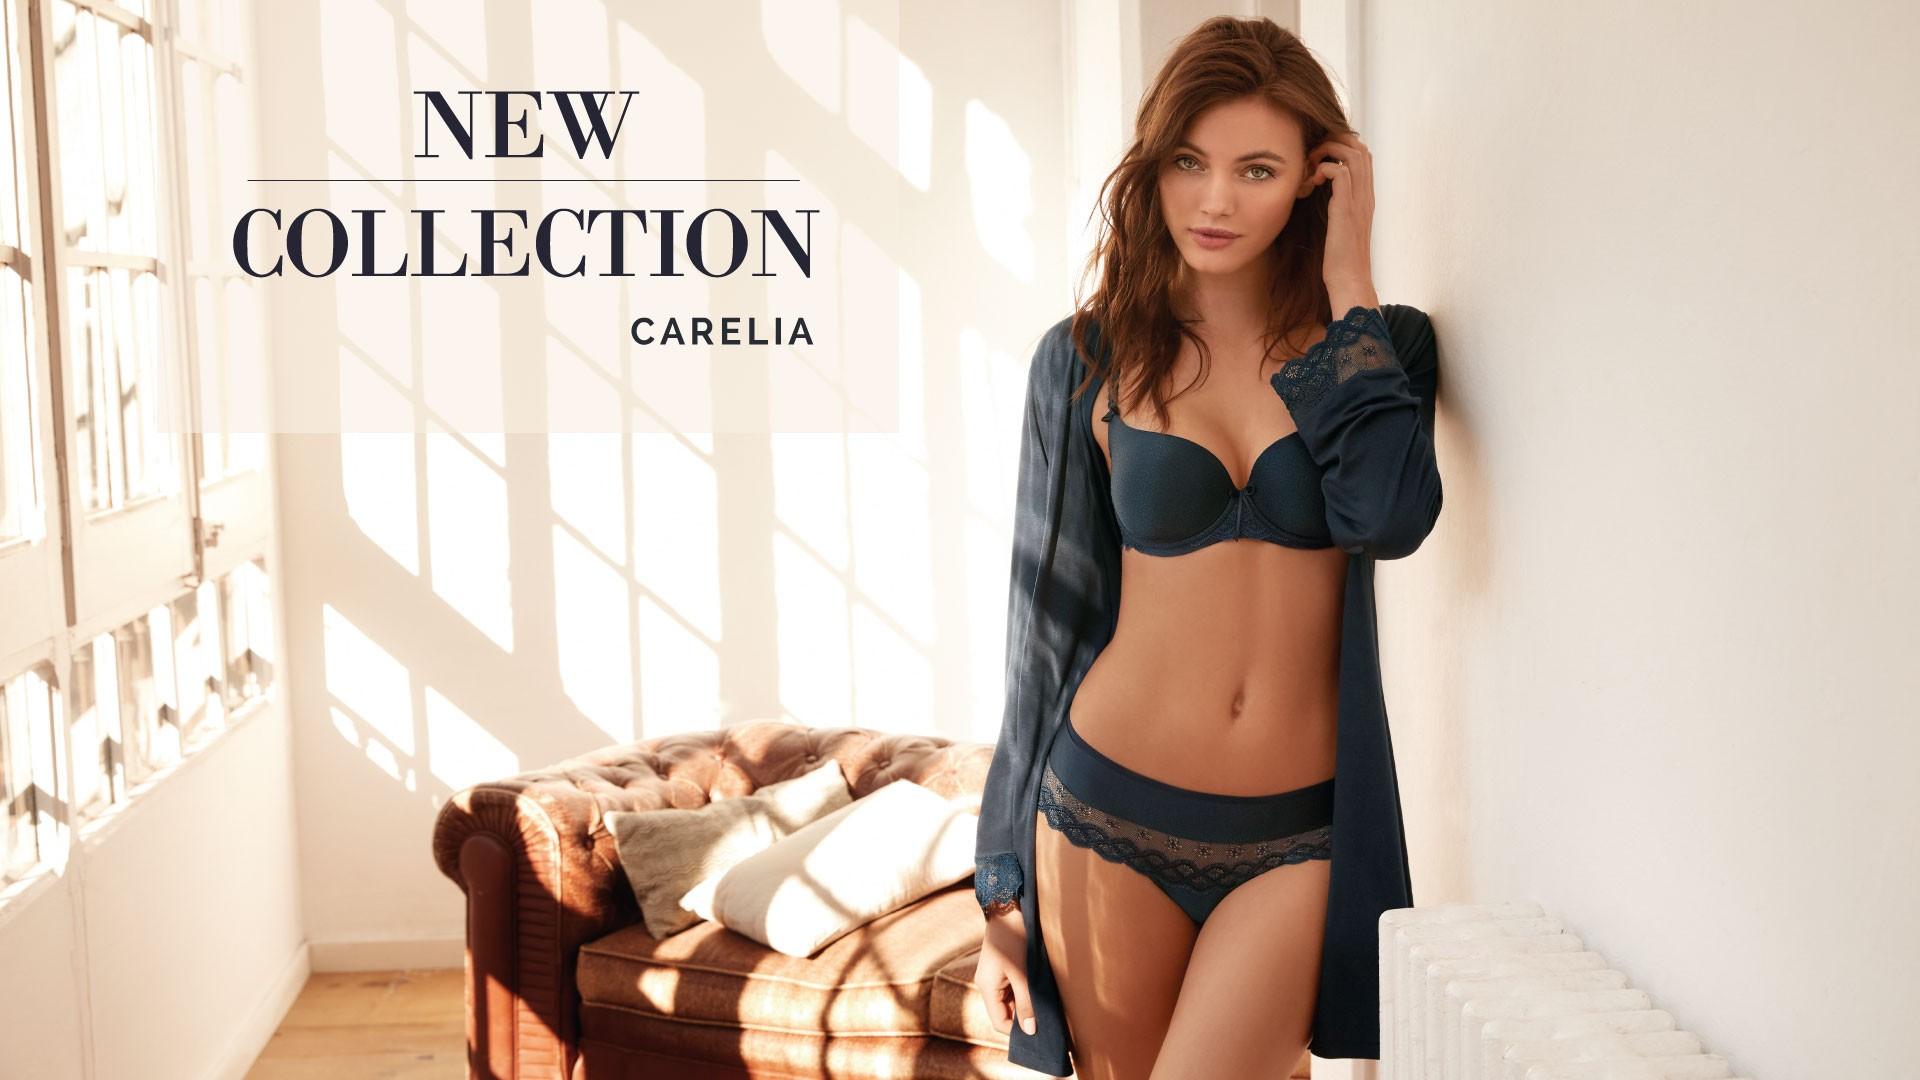 Carelia new collection